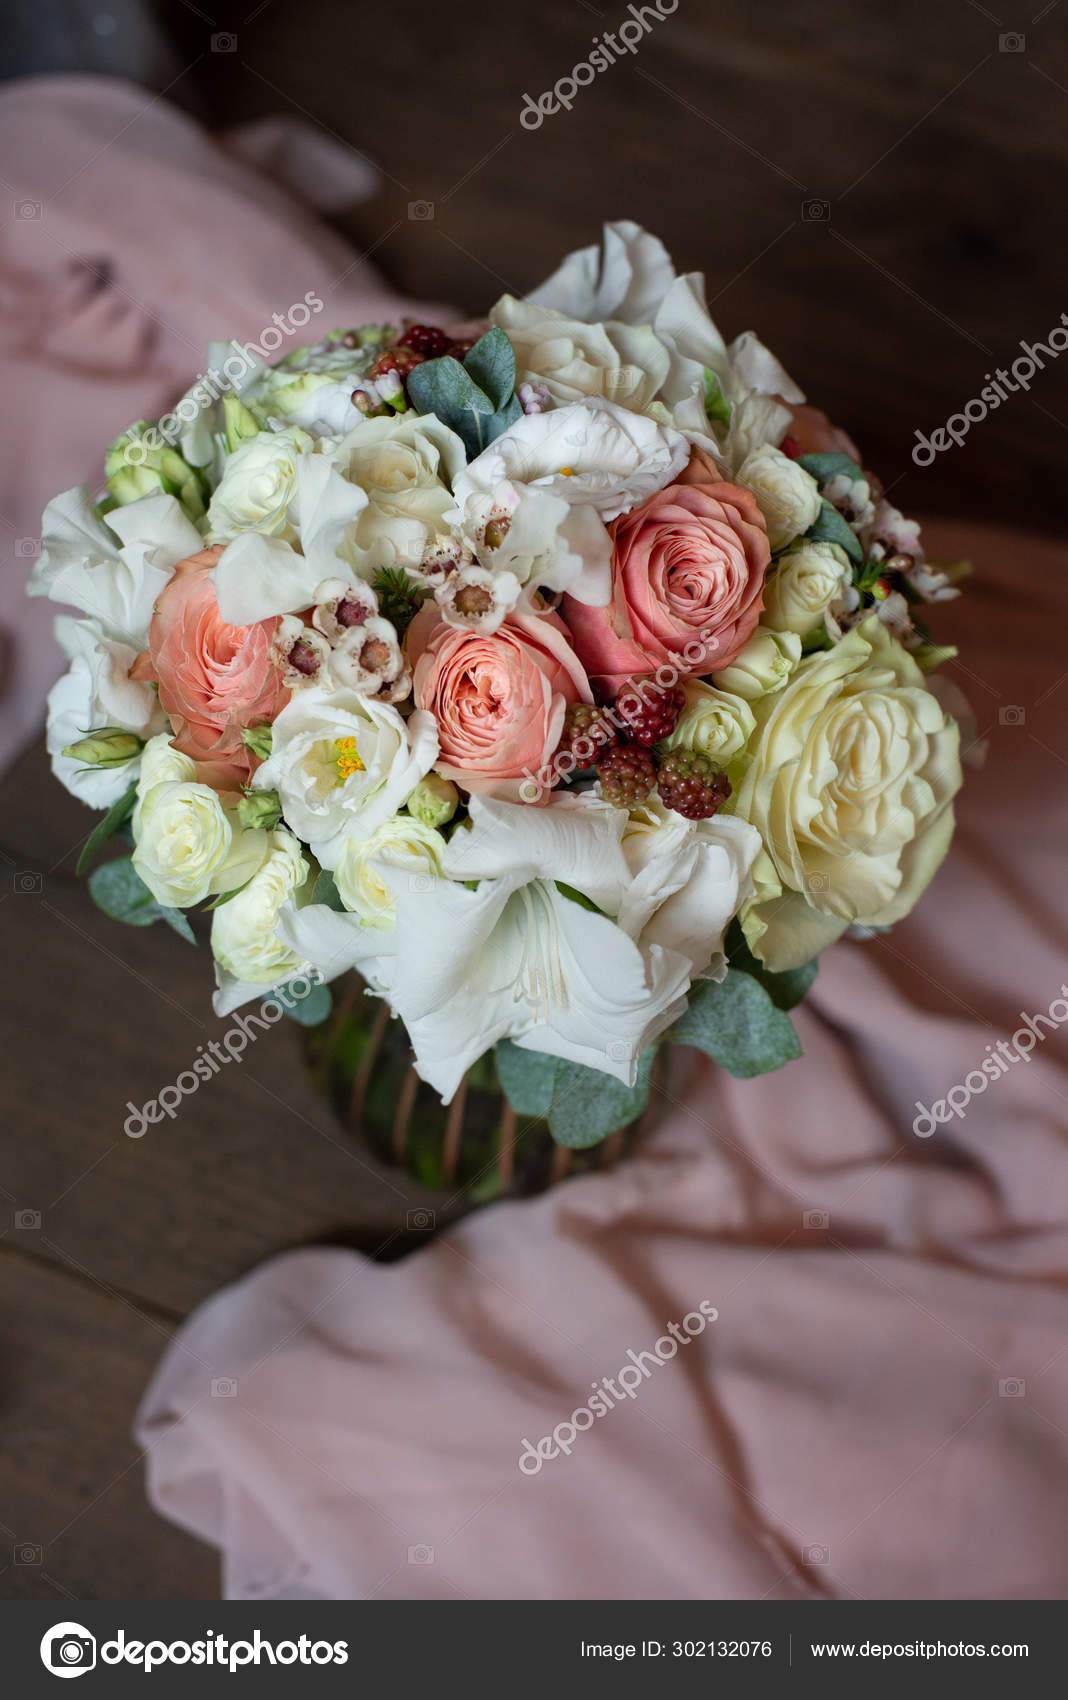 Most Beautiful Bouquet Flowers Anemone Rose Ranunculus Mattiola Tulip Eucalyptus Stock Photo C Plan905 302132076